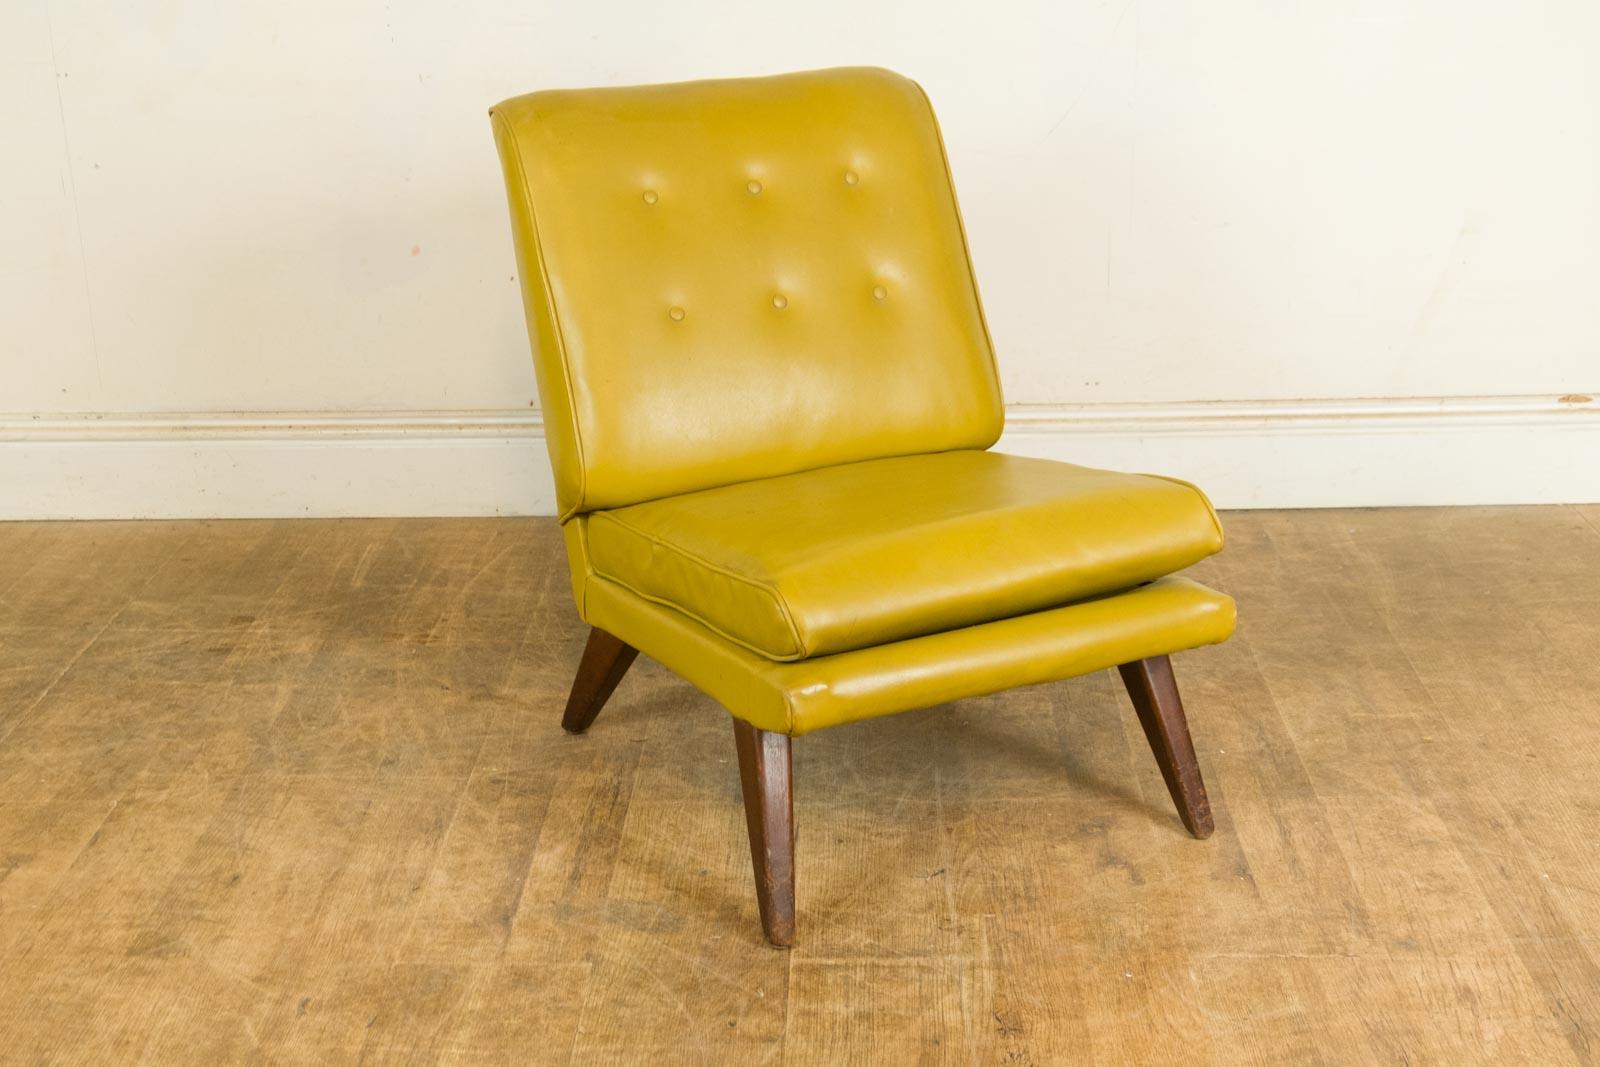 bedroom chair retro kohls cushions vintage green vinyl low by g plan e